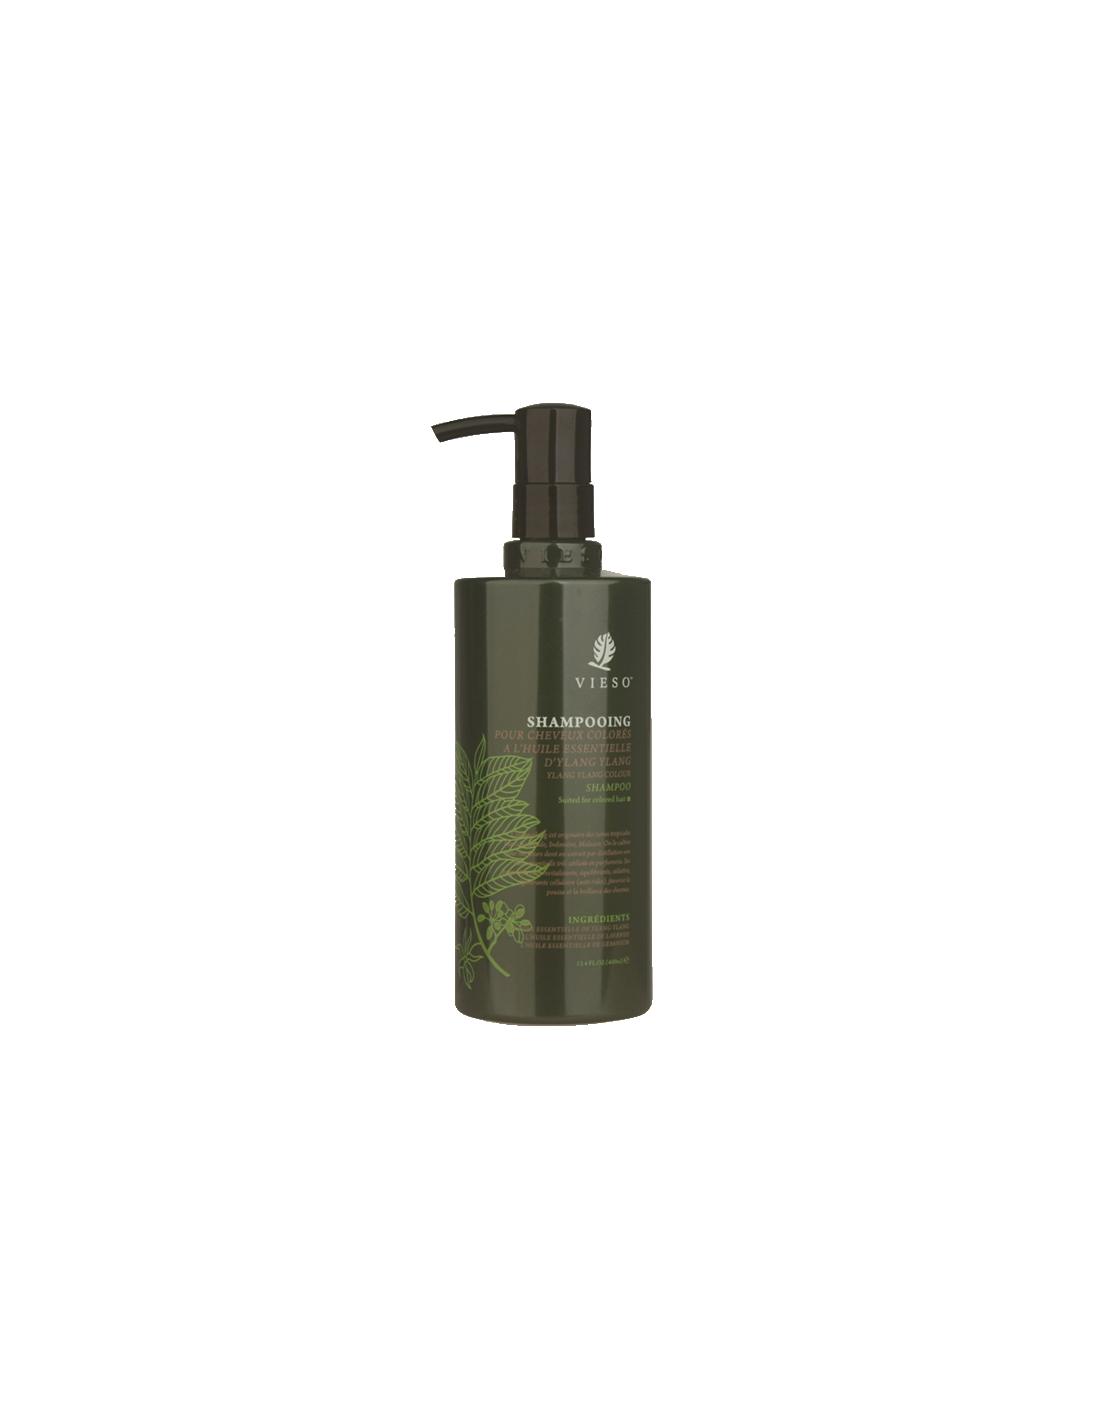 Vieso косметика для волос купить интернет магазин термозащита avon отзывы